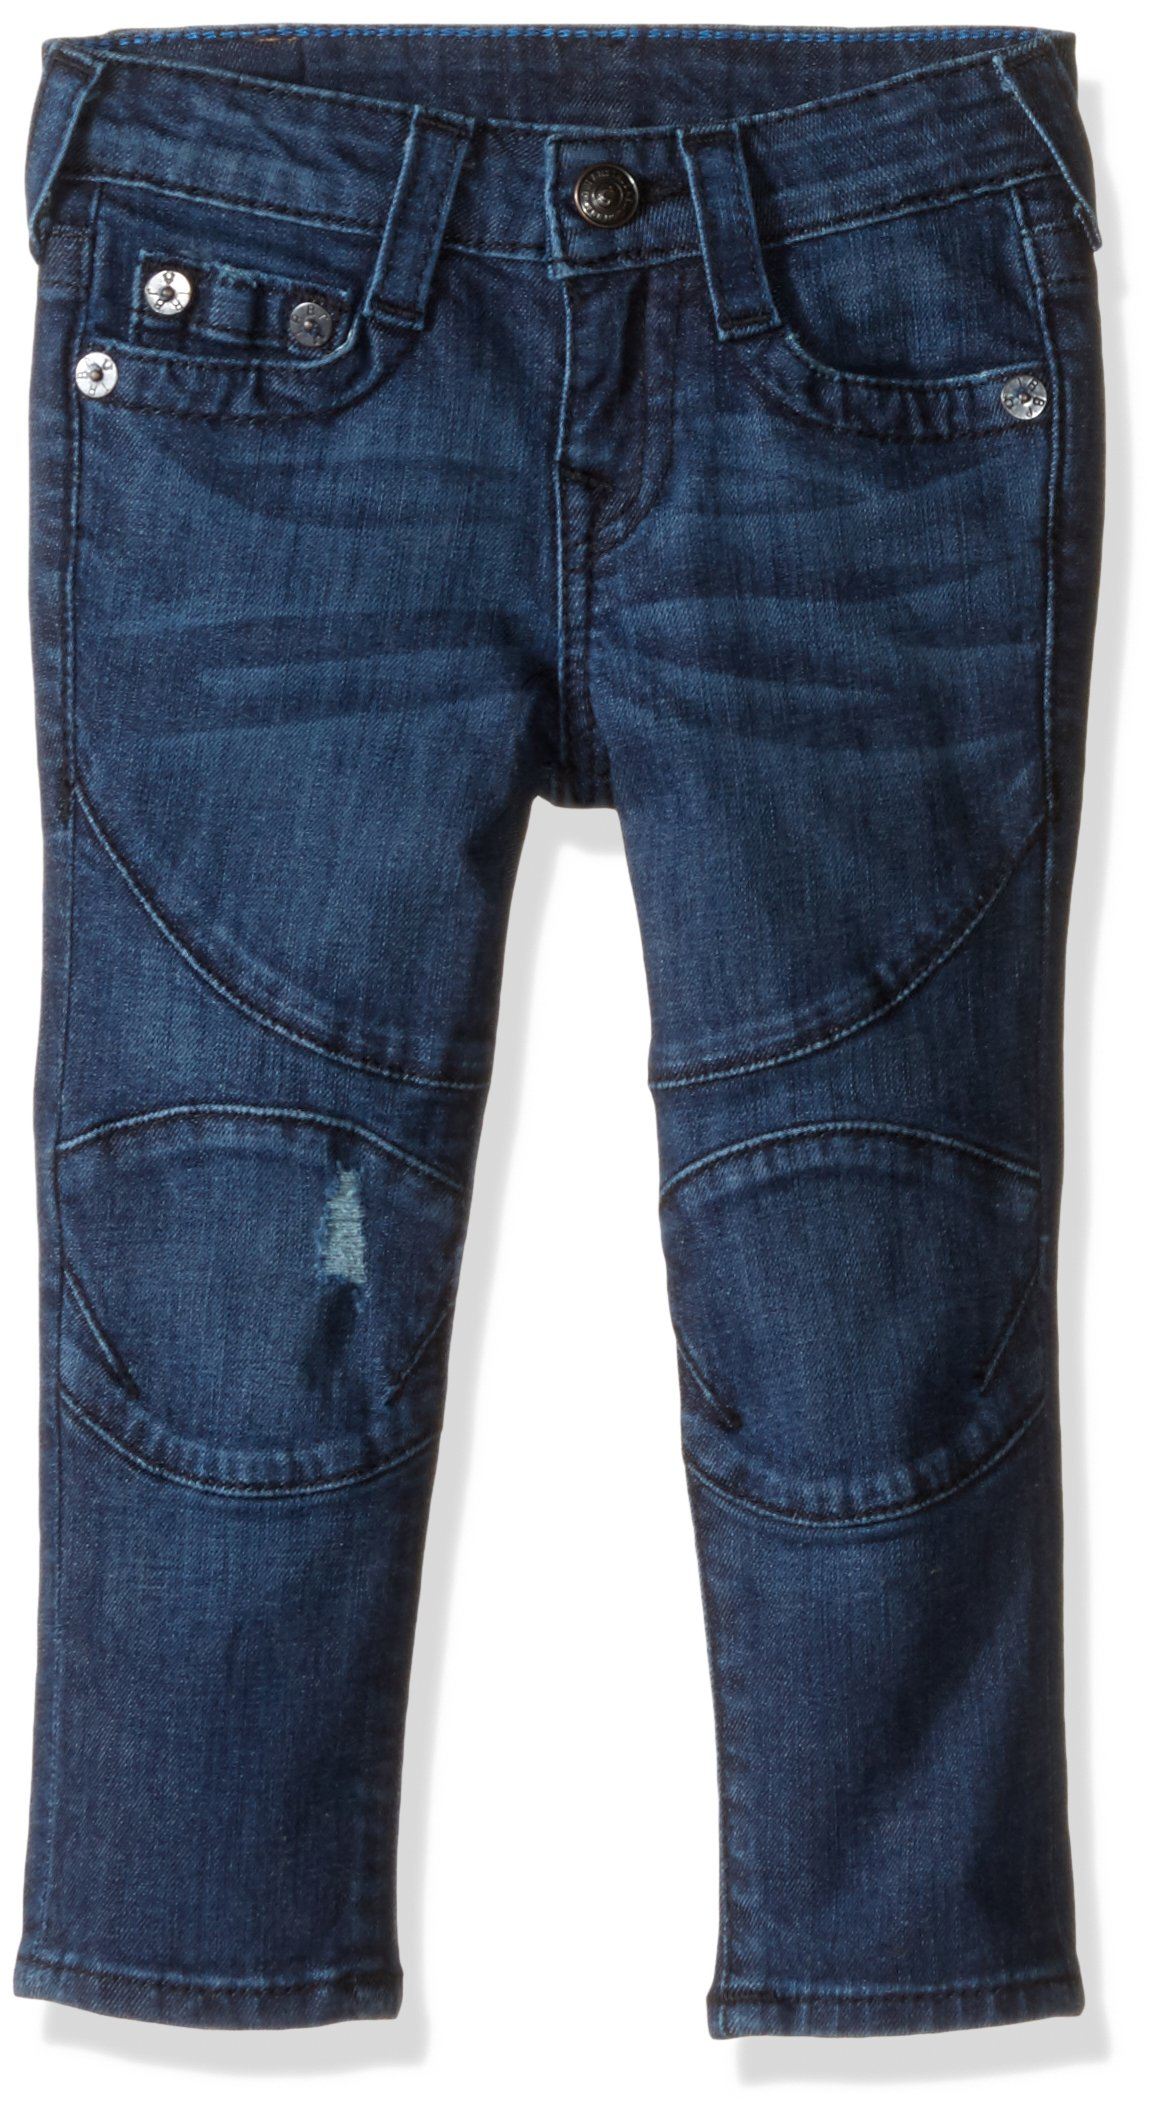 True Religion Boys' Ricky Super T Jeans, Solaris Wash, 12